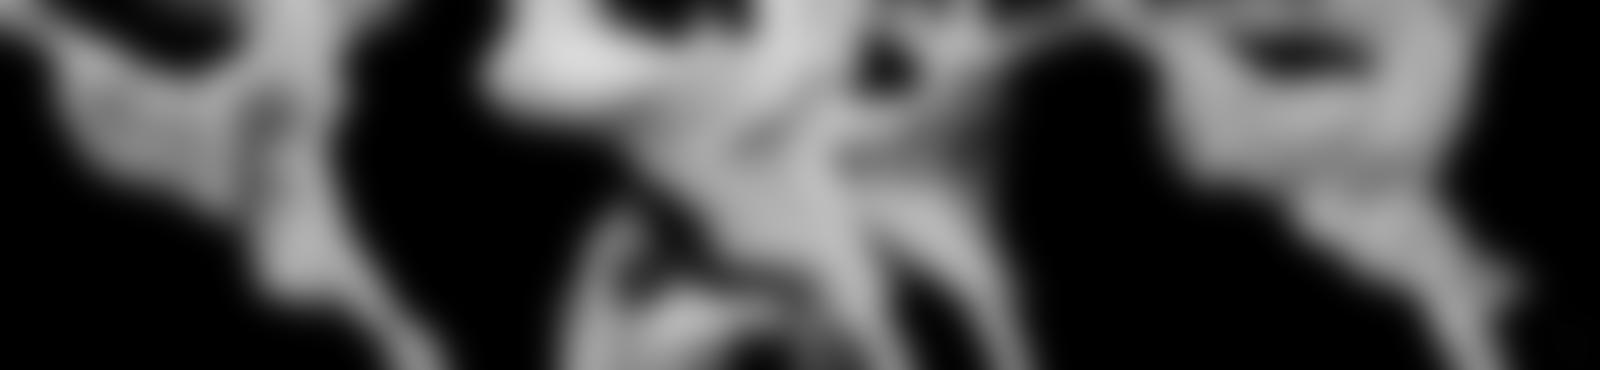 Blurred 20be3691 f258 45f9 9ea6 09c8b821e804